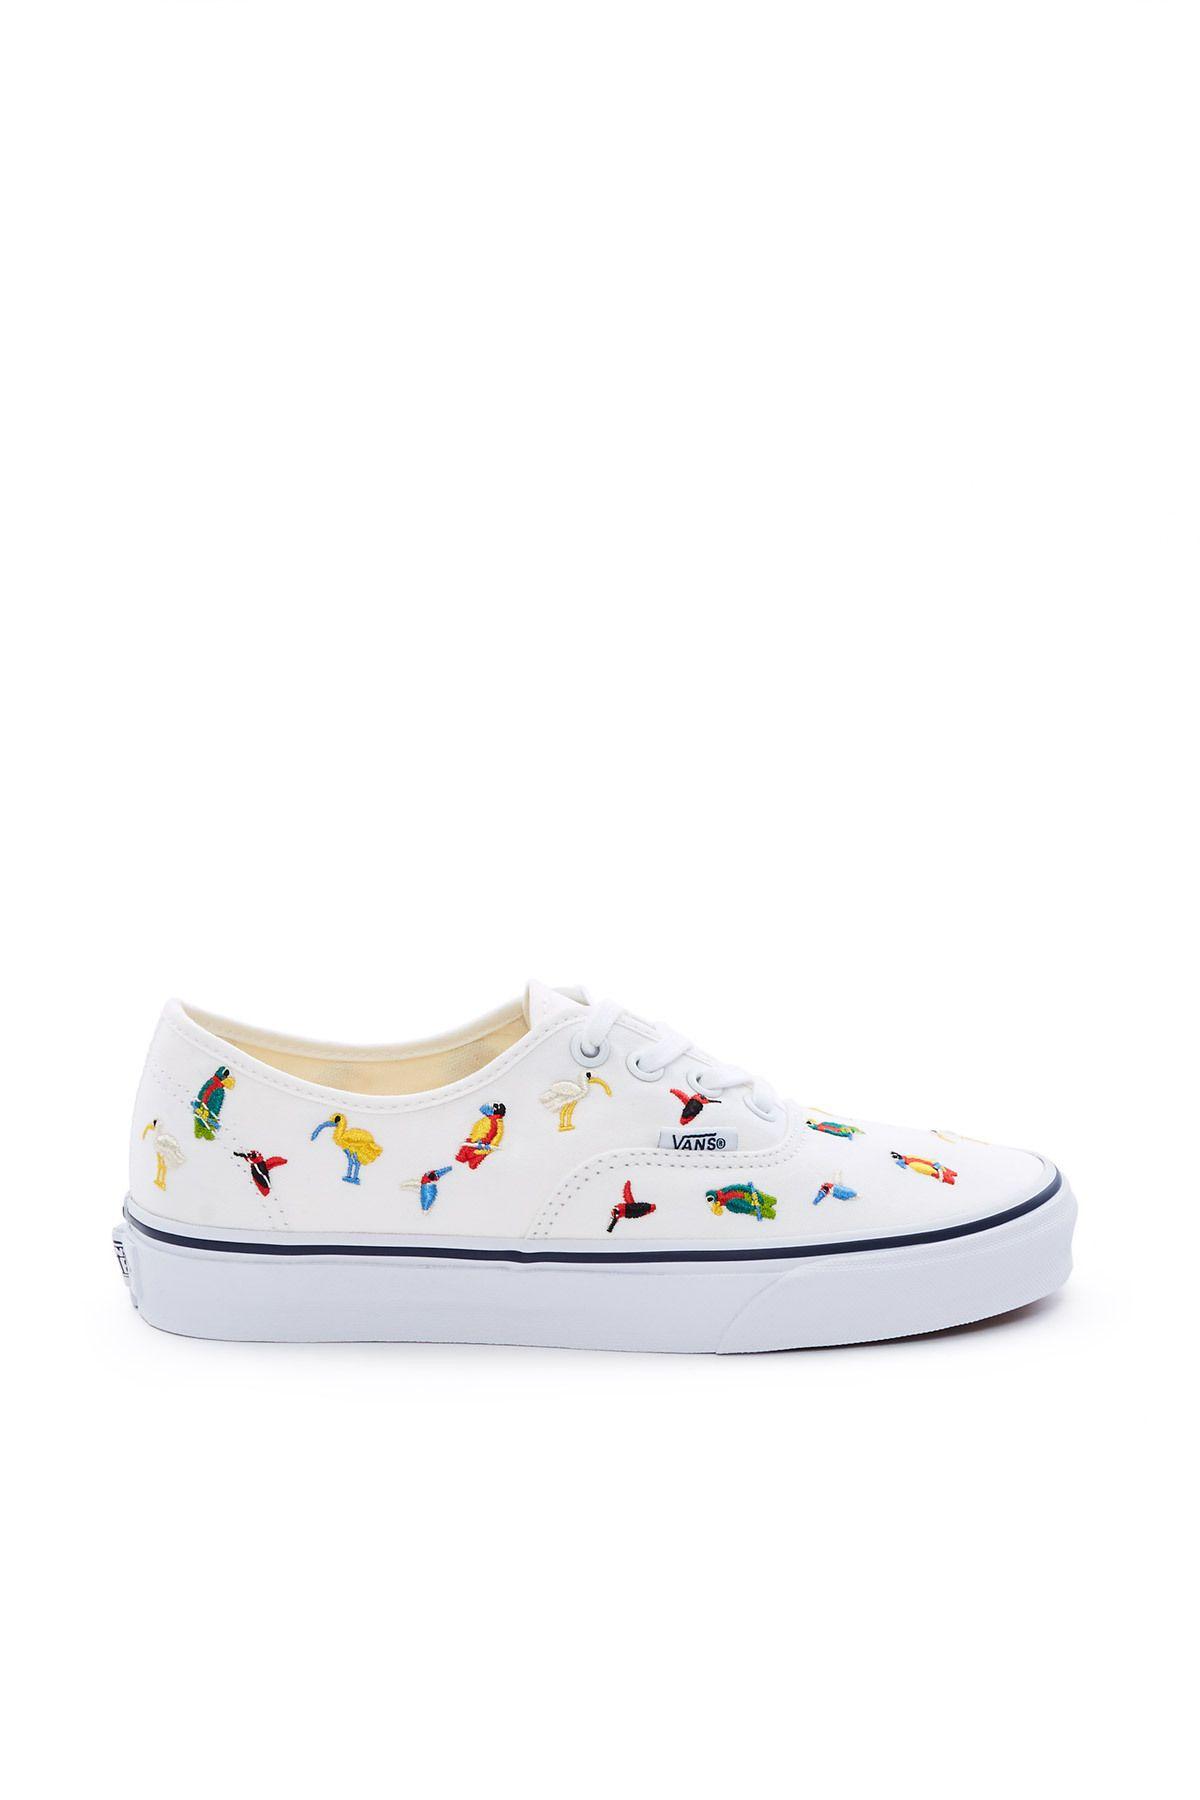 99dba410a30b47 vans bird print sneaker